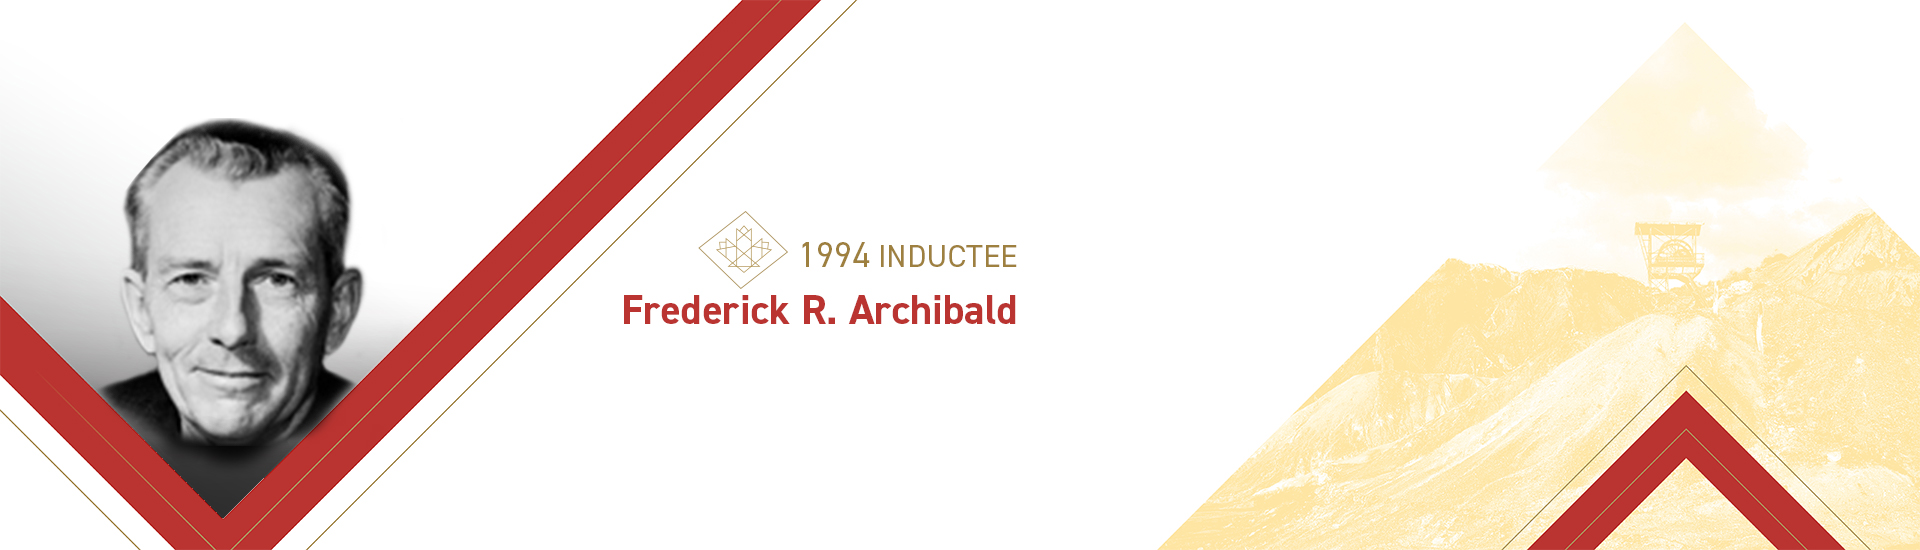 Frederick R. Archibald (1905 – 1996)